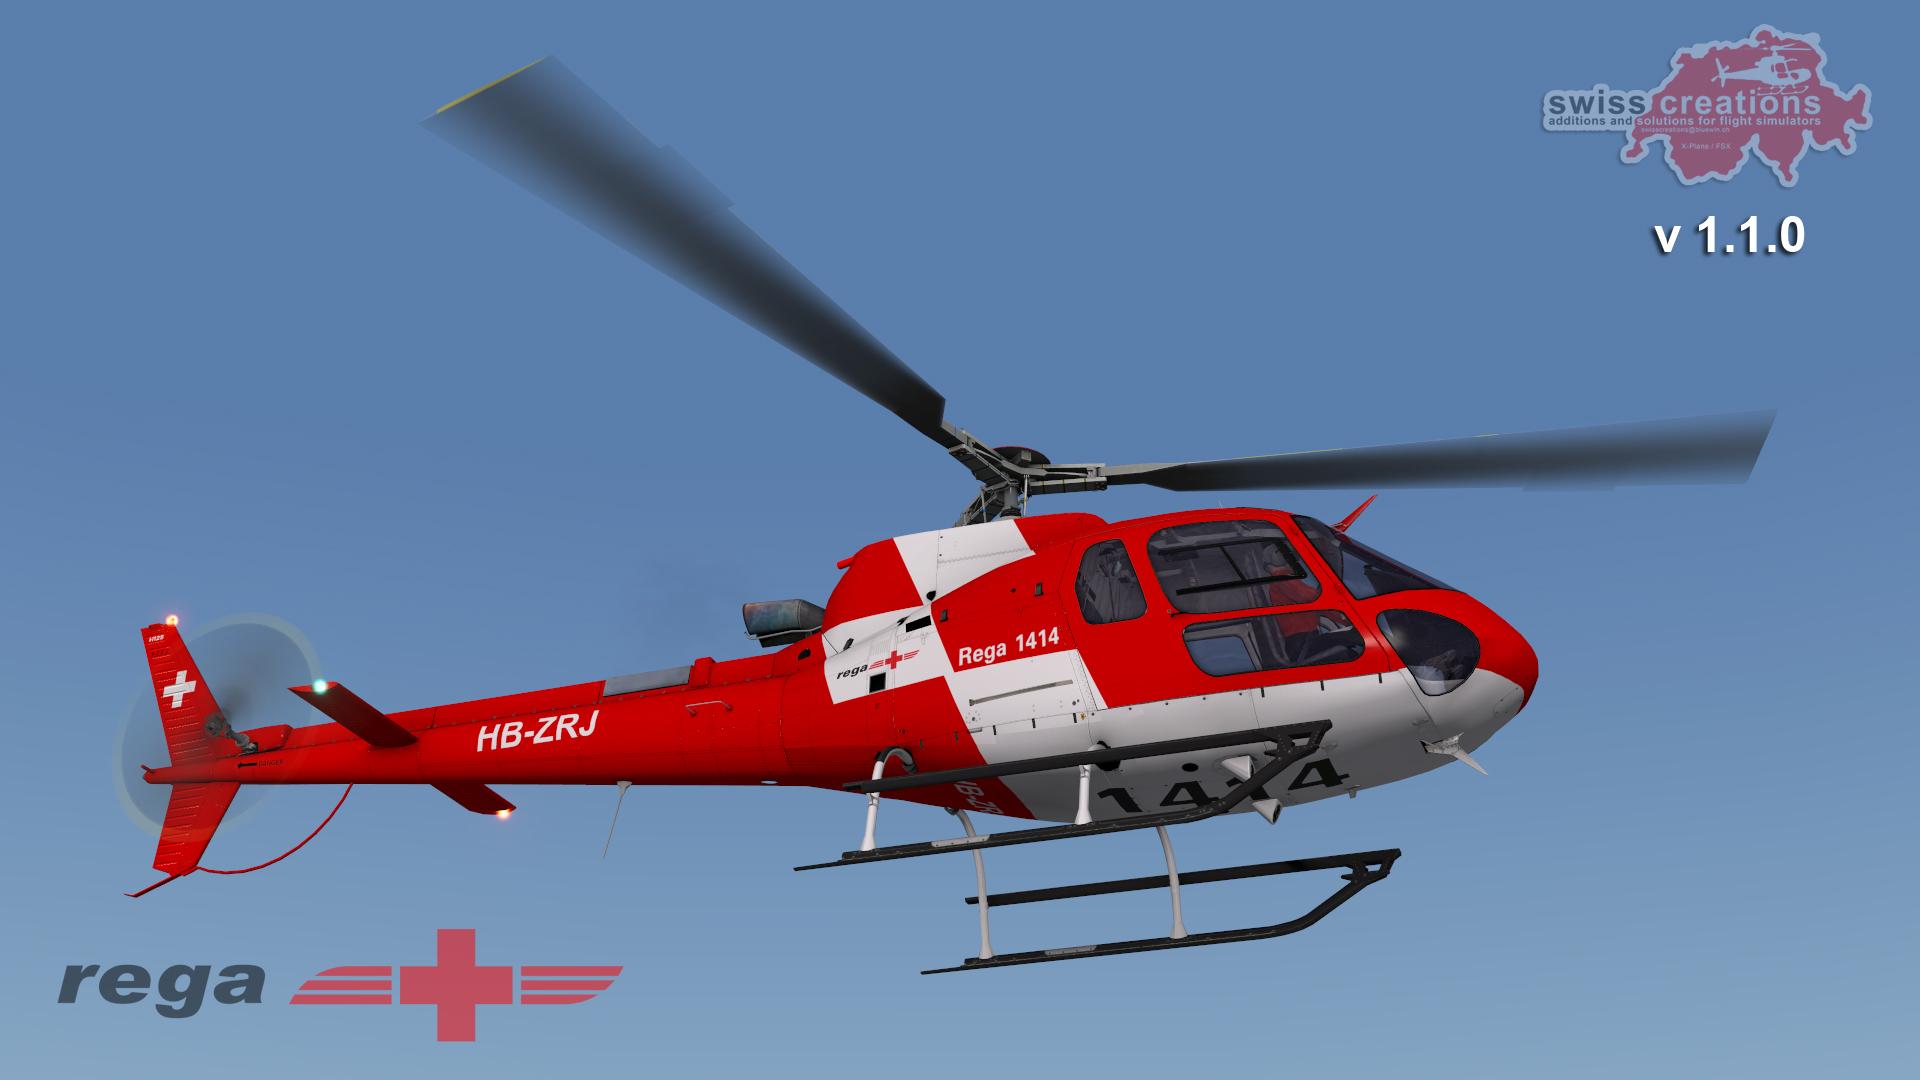 Elicottero 350 : Swisscreationss content x plane.org forum